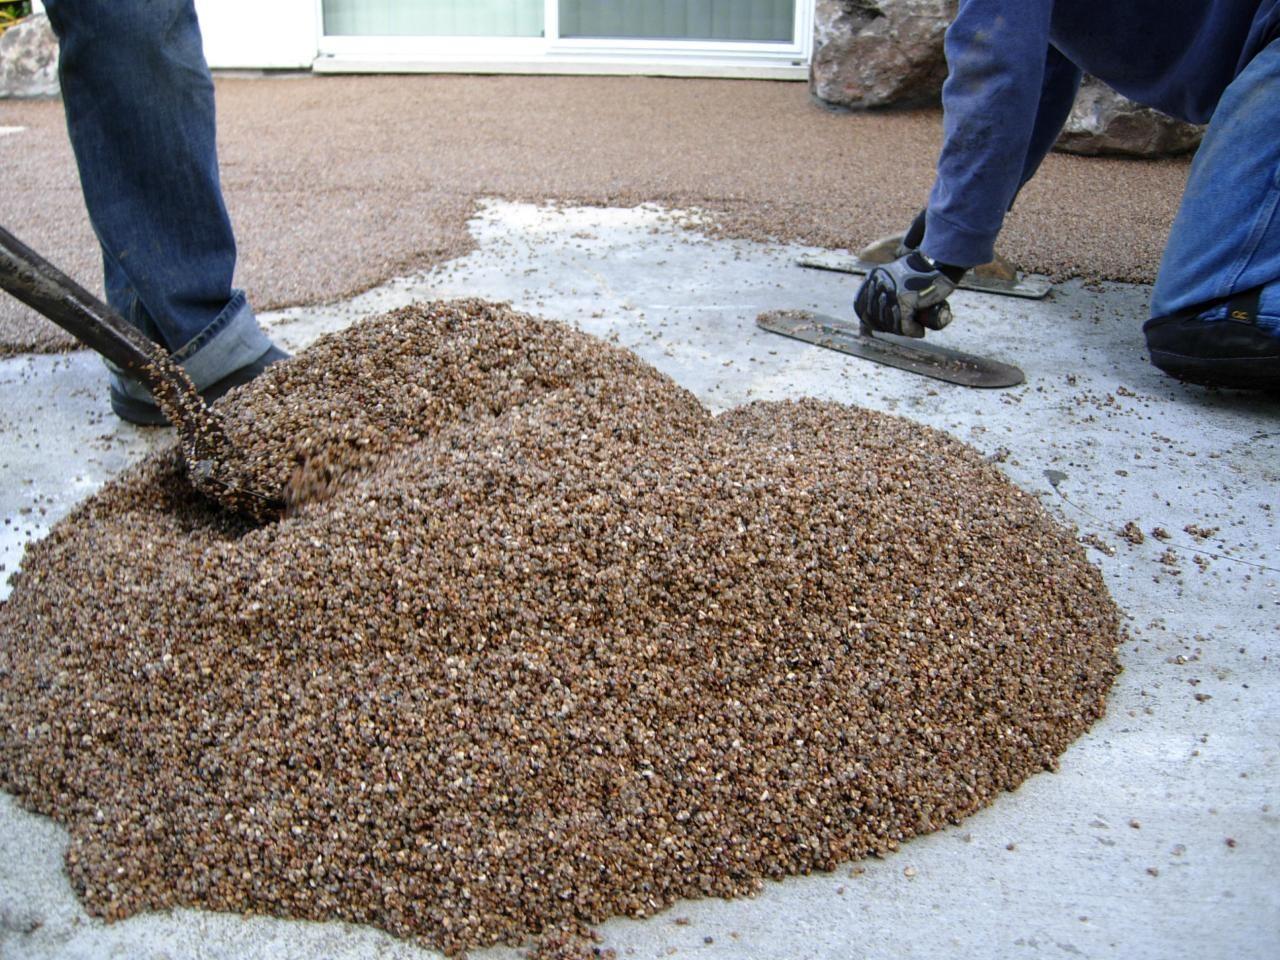 Laying A Pebble Patio Concrete Patio Makeover Pebble Patio Patio Flooring